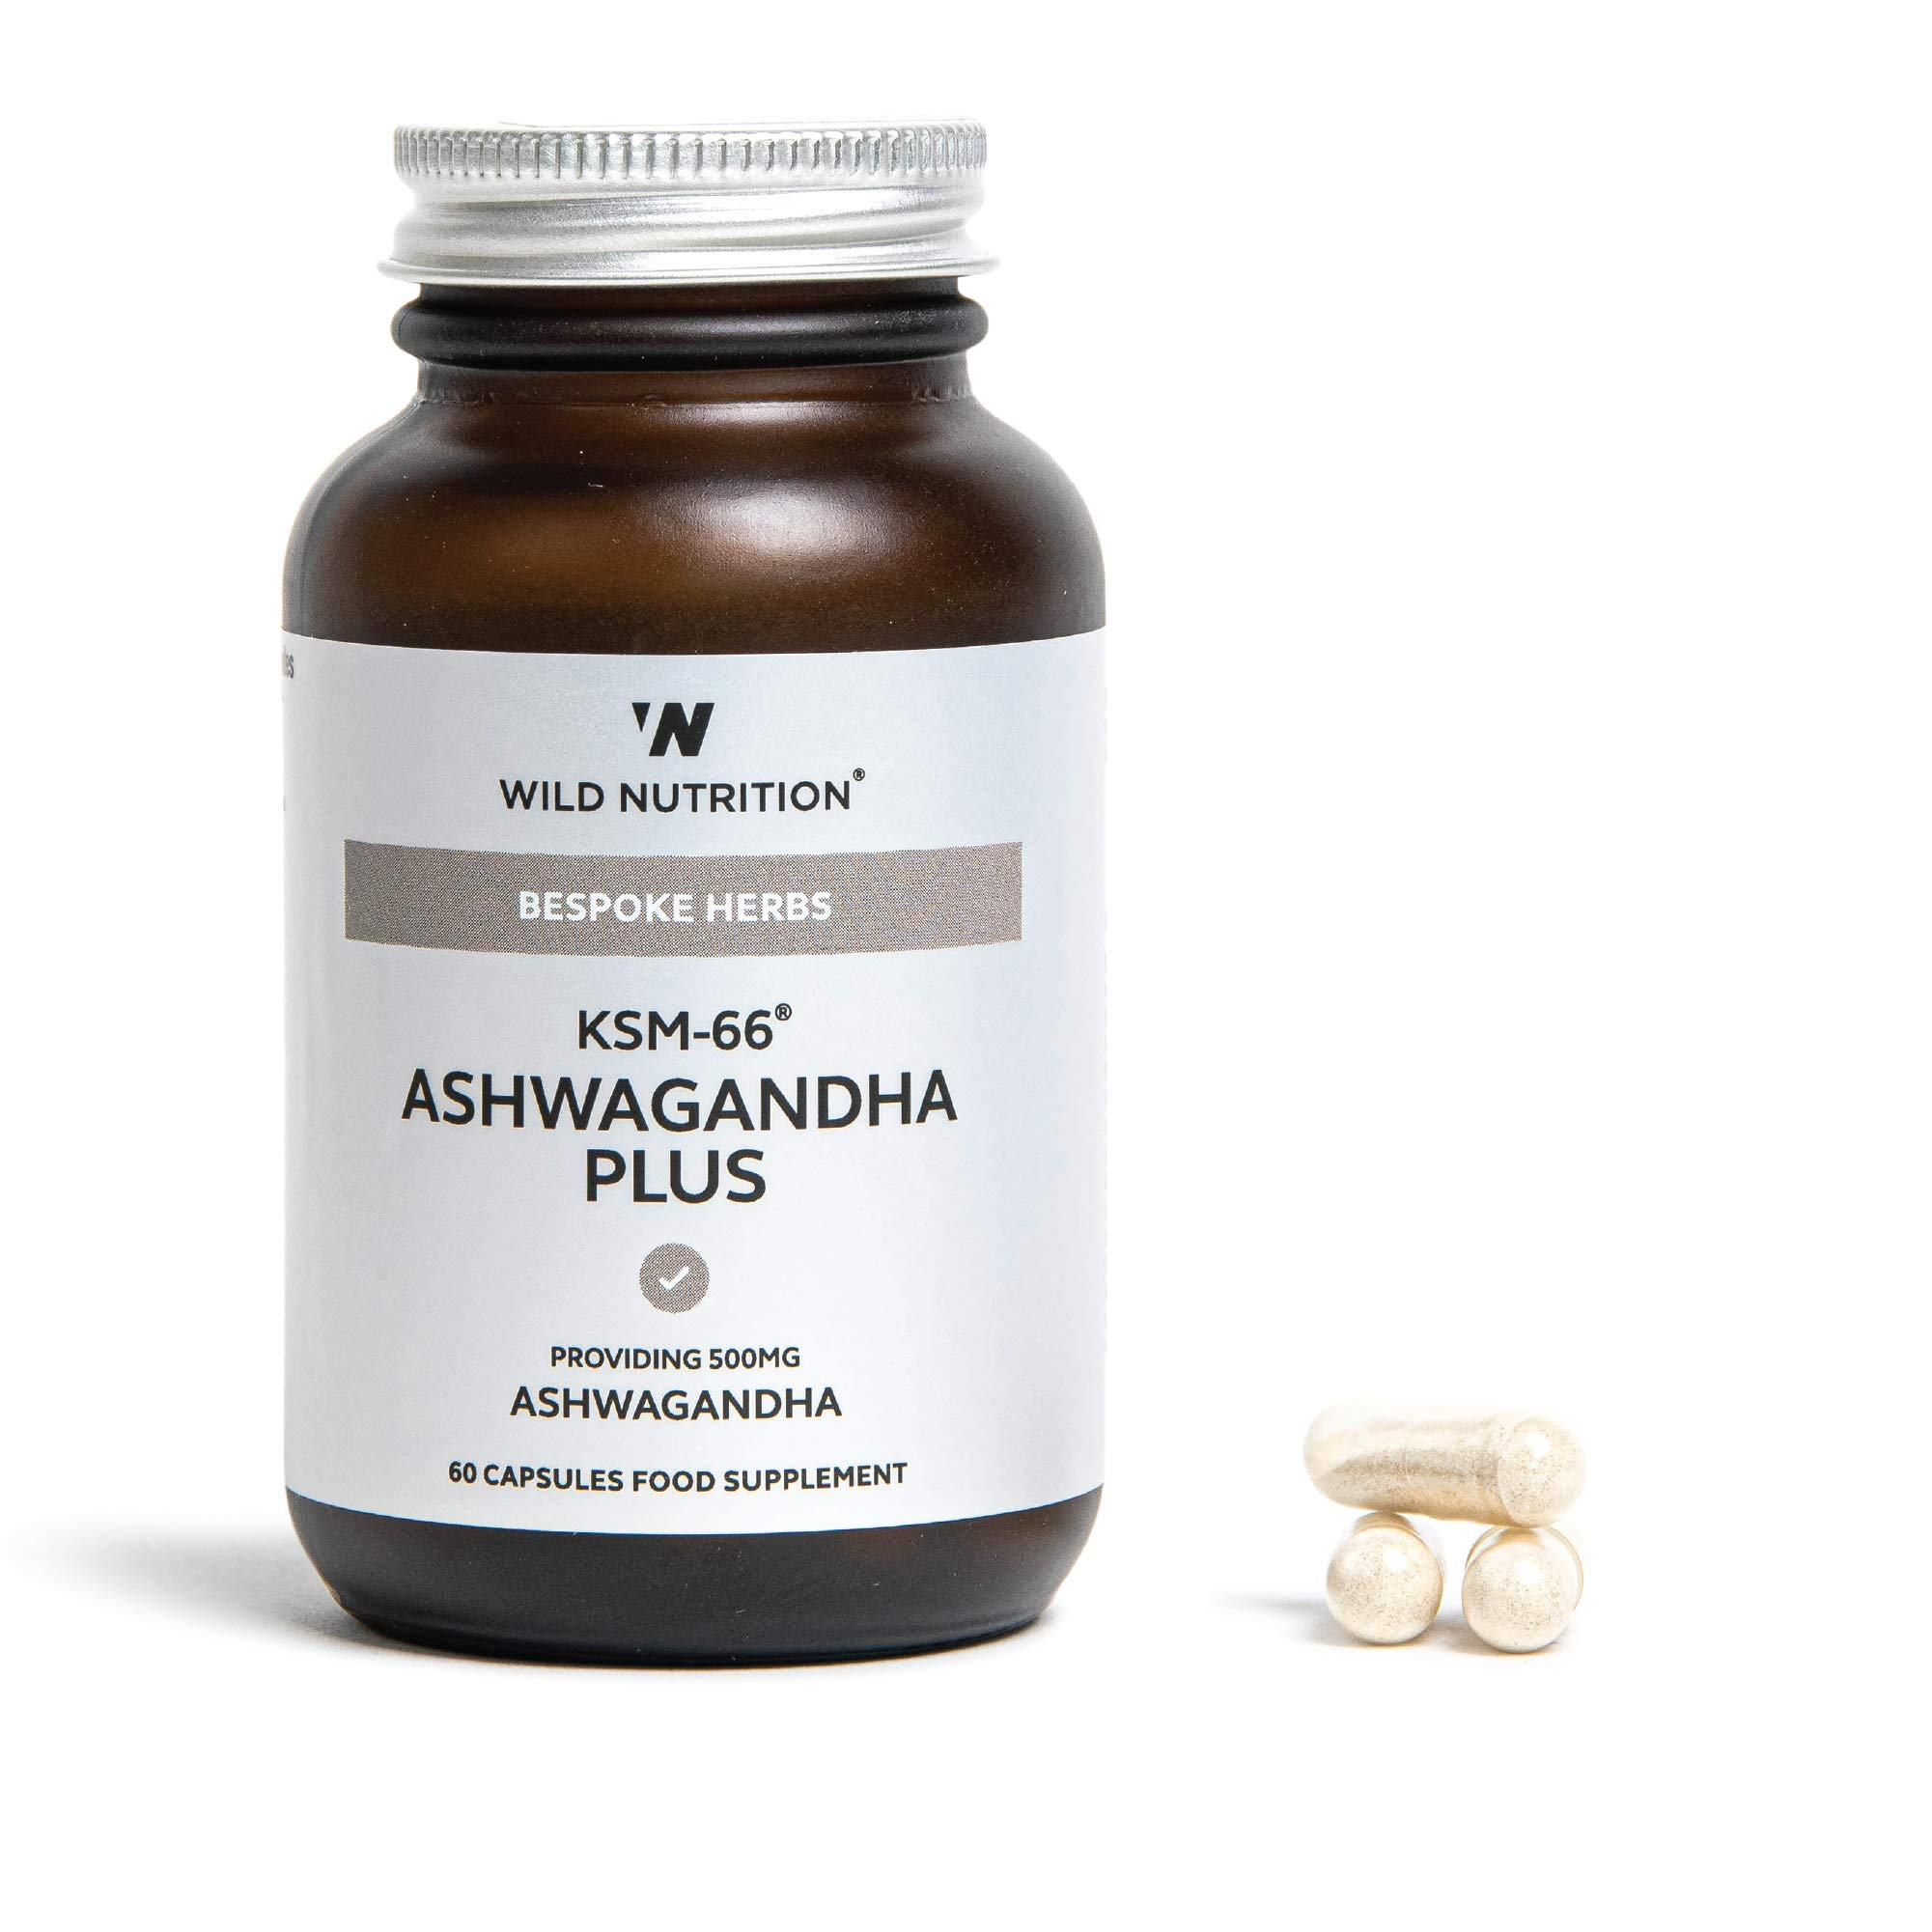 Wild Nutrition – Food Grown KSM-66 Ashwagandha Plus – Natural Mineral Supplement – 60 Capsules